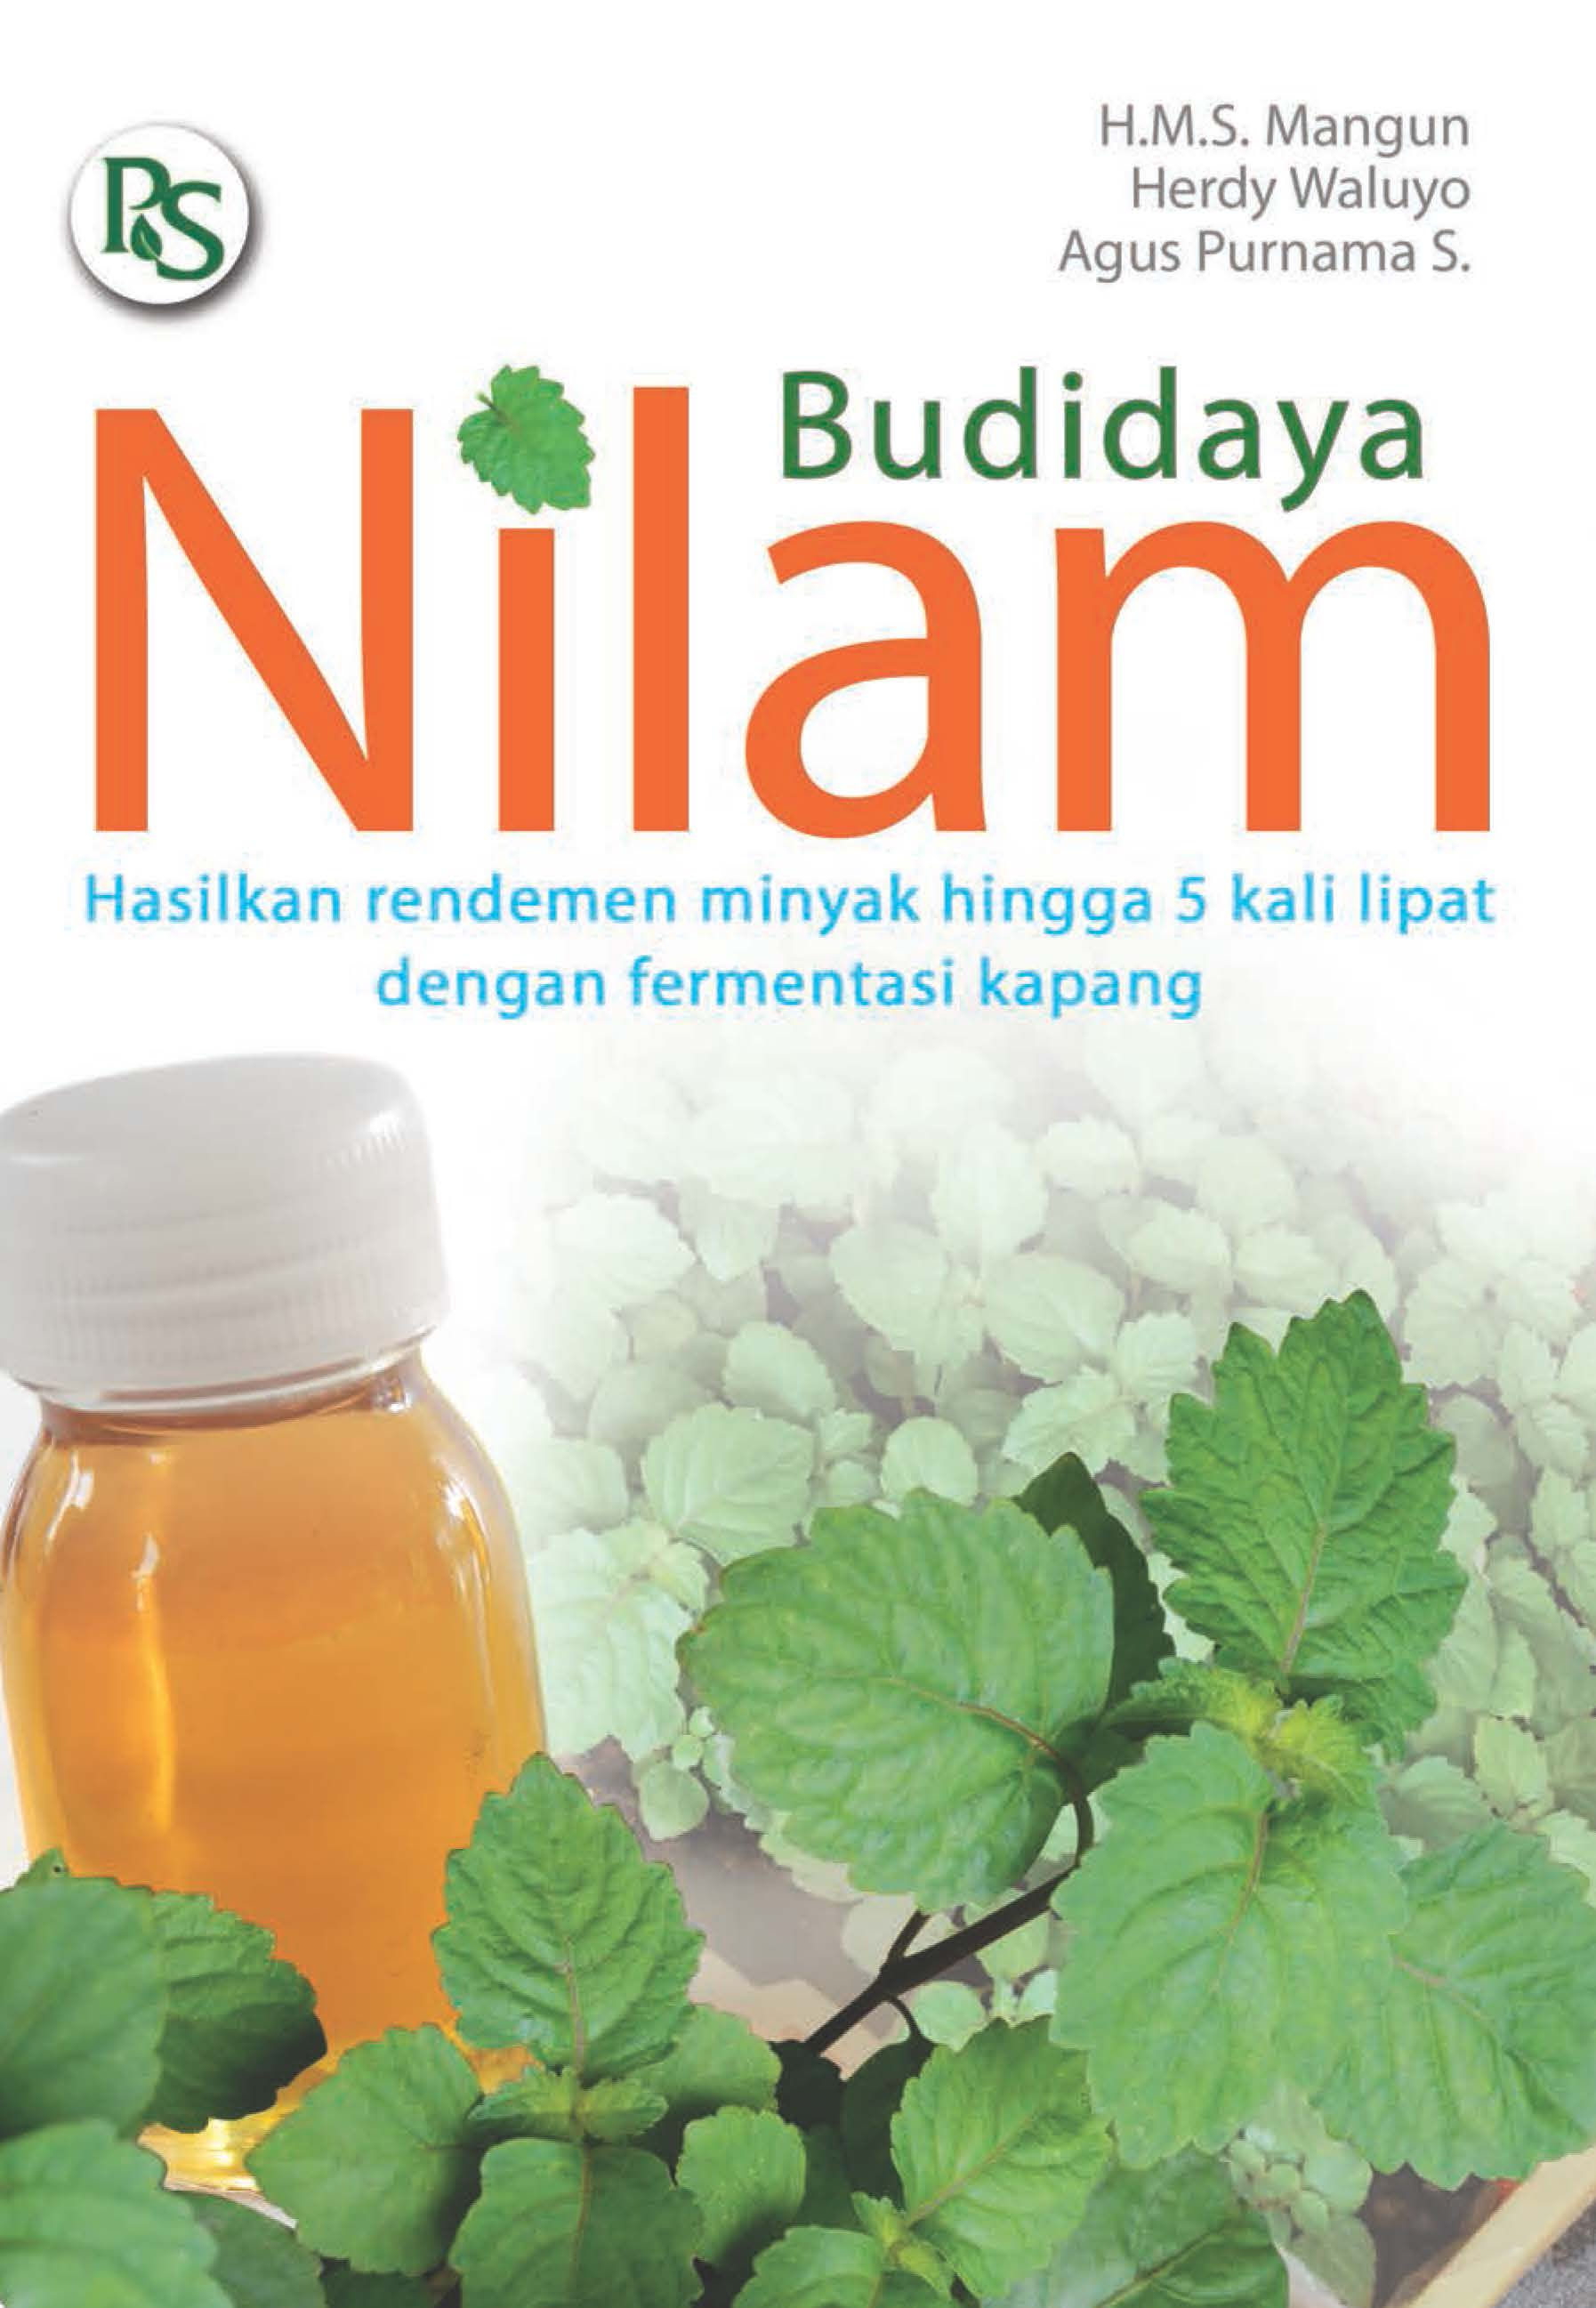 Budidaya nilam [sumber elektronis]